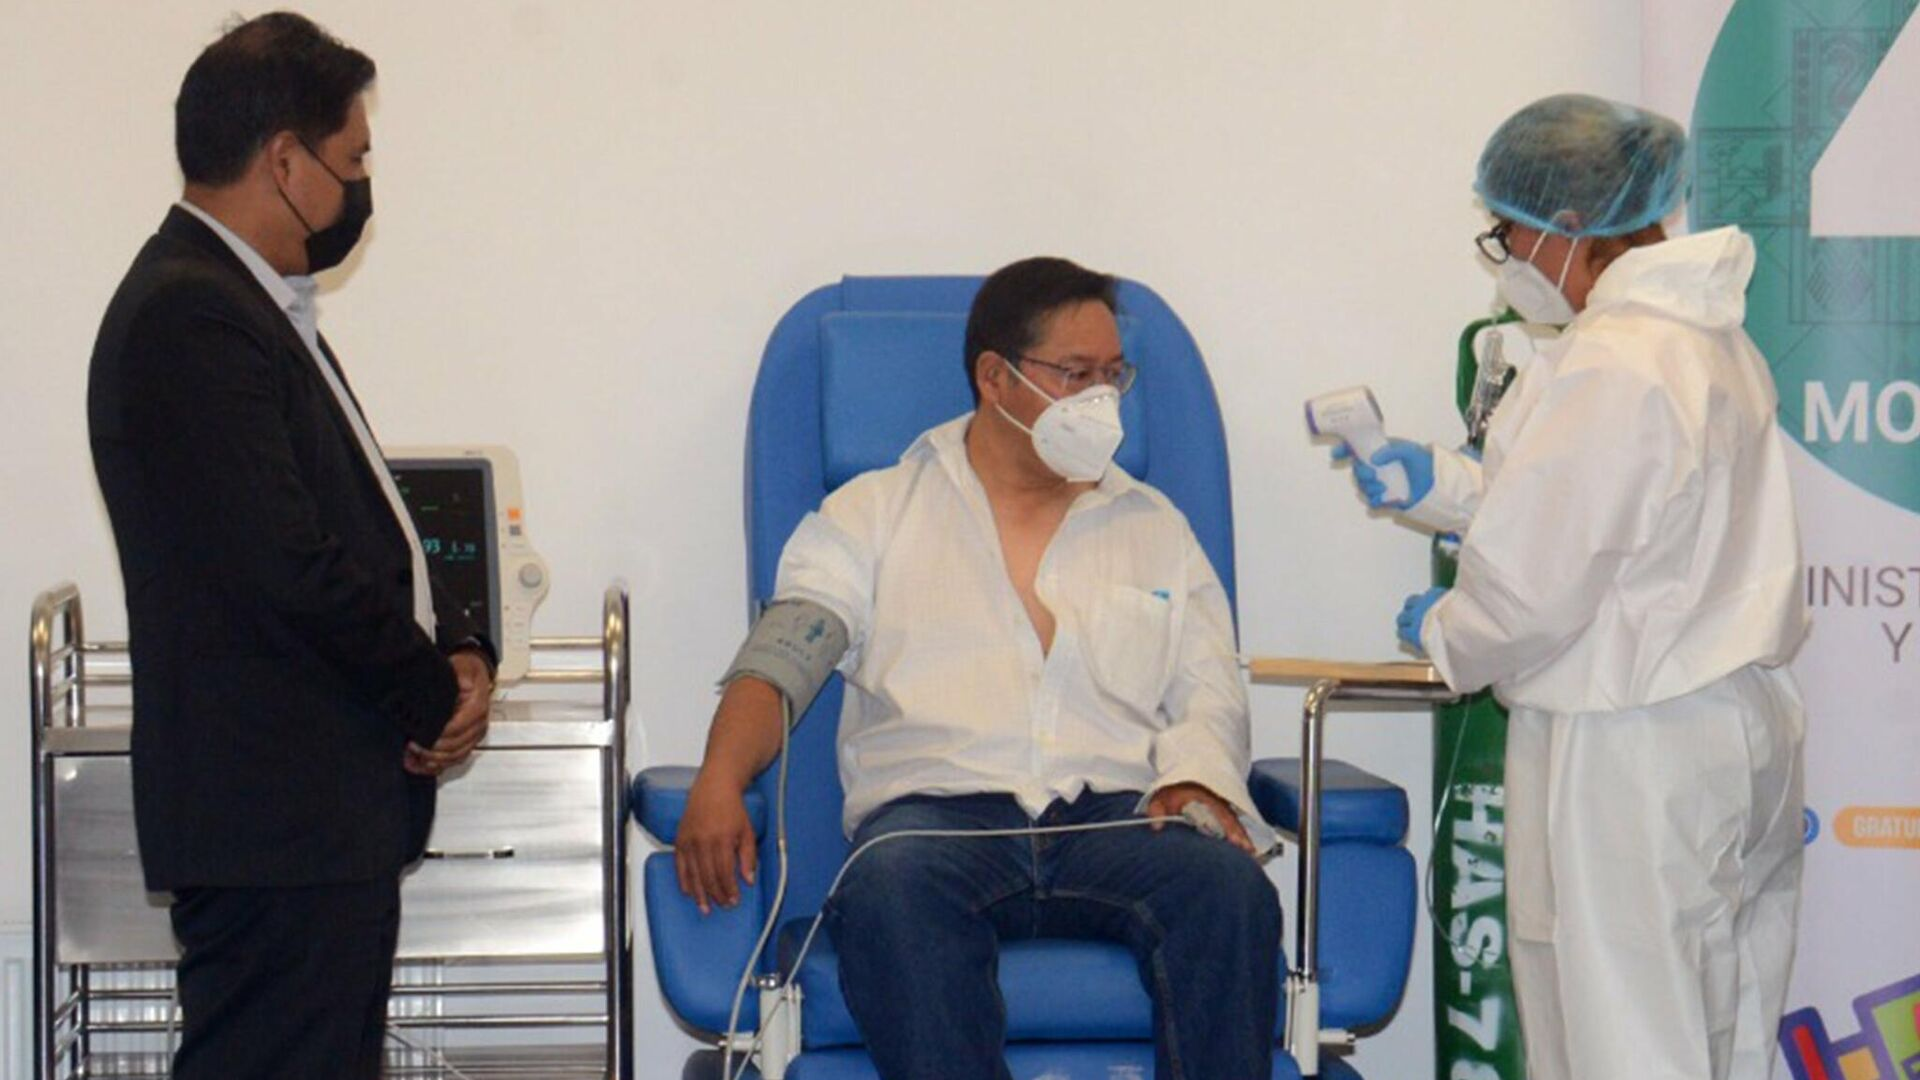 El presidente de Bolivia, Luis Arce, recibe la primera dosis de la vacuna Sputnik V - Sputnik Mundo, 1920, 24.05.2021